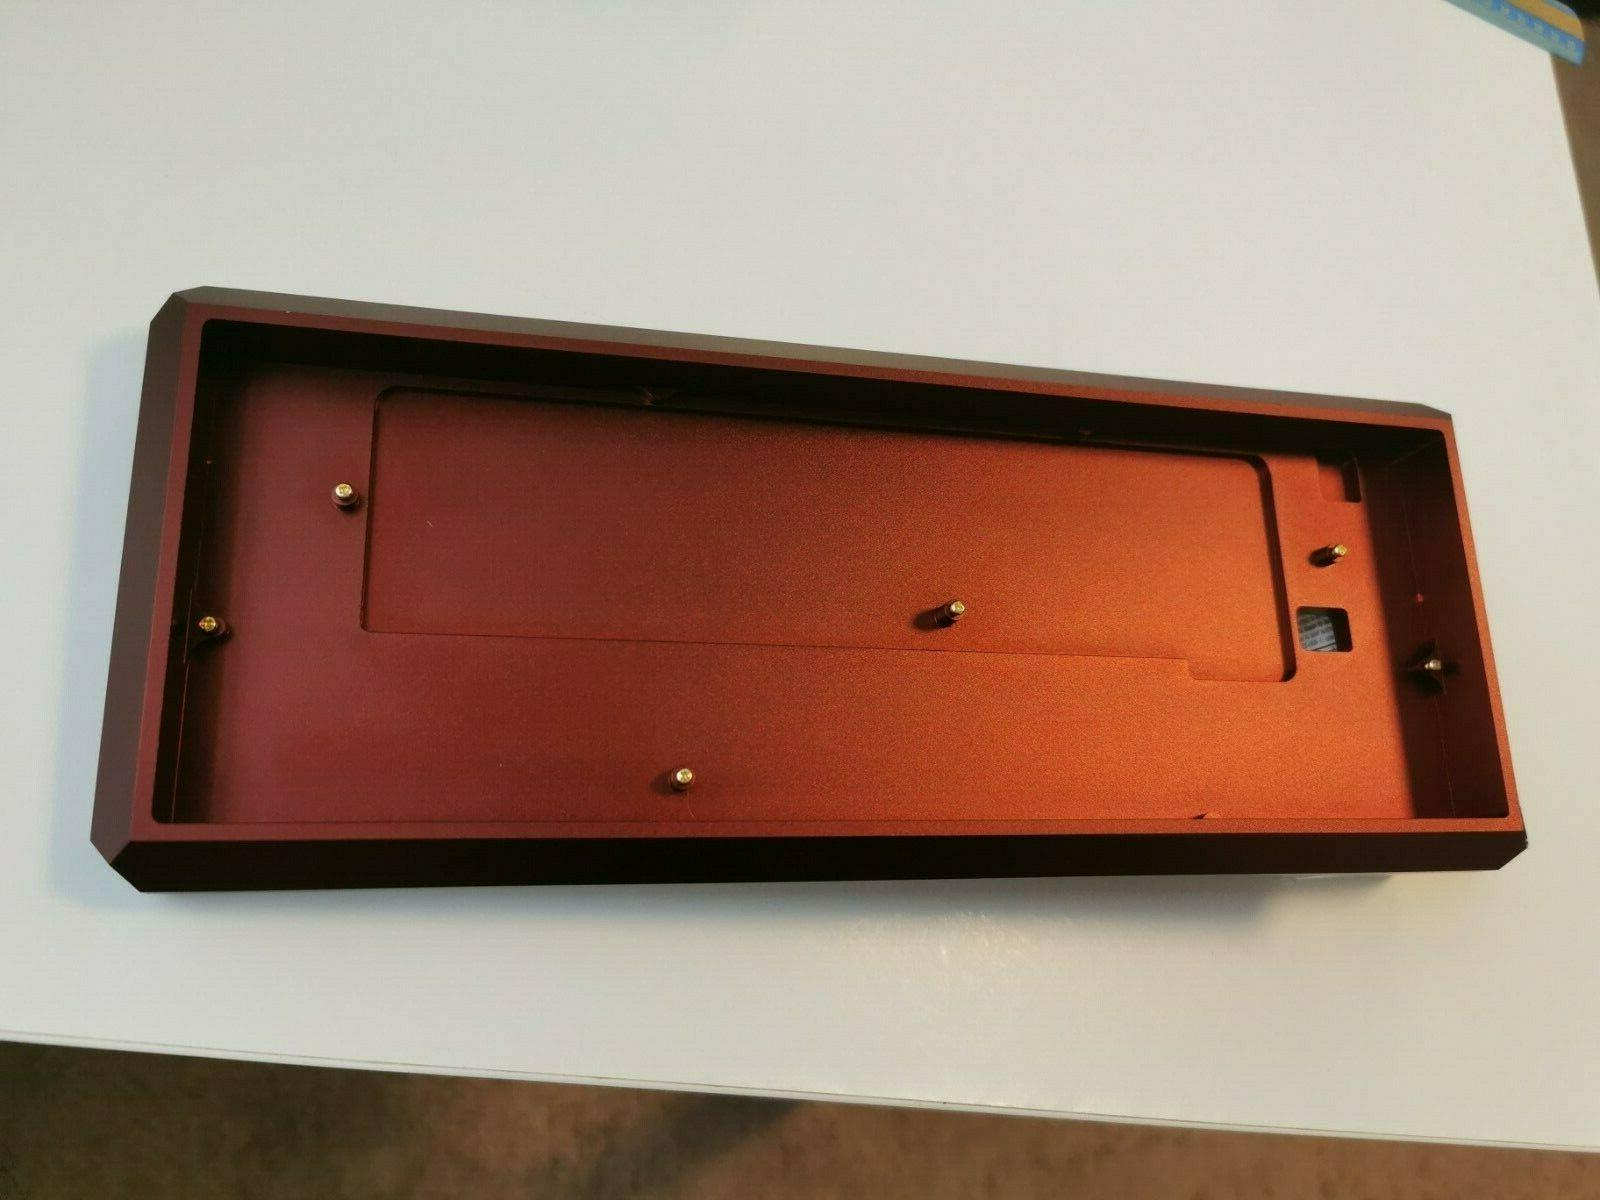 kbdfans 5 aluminum case, keyboards, dark red